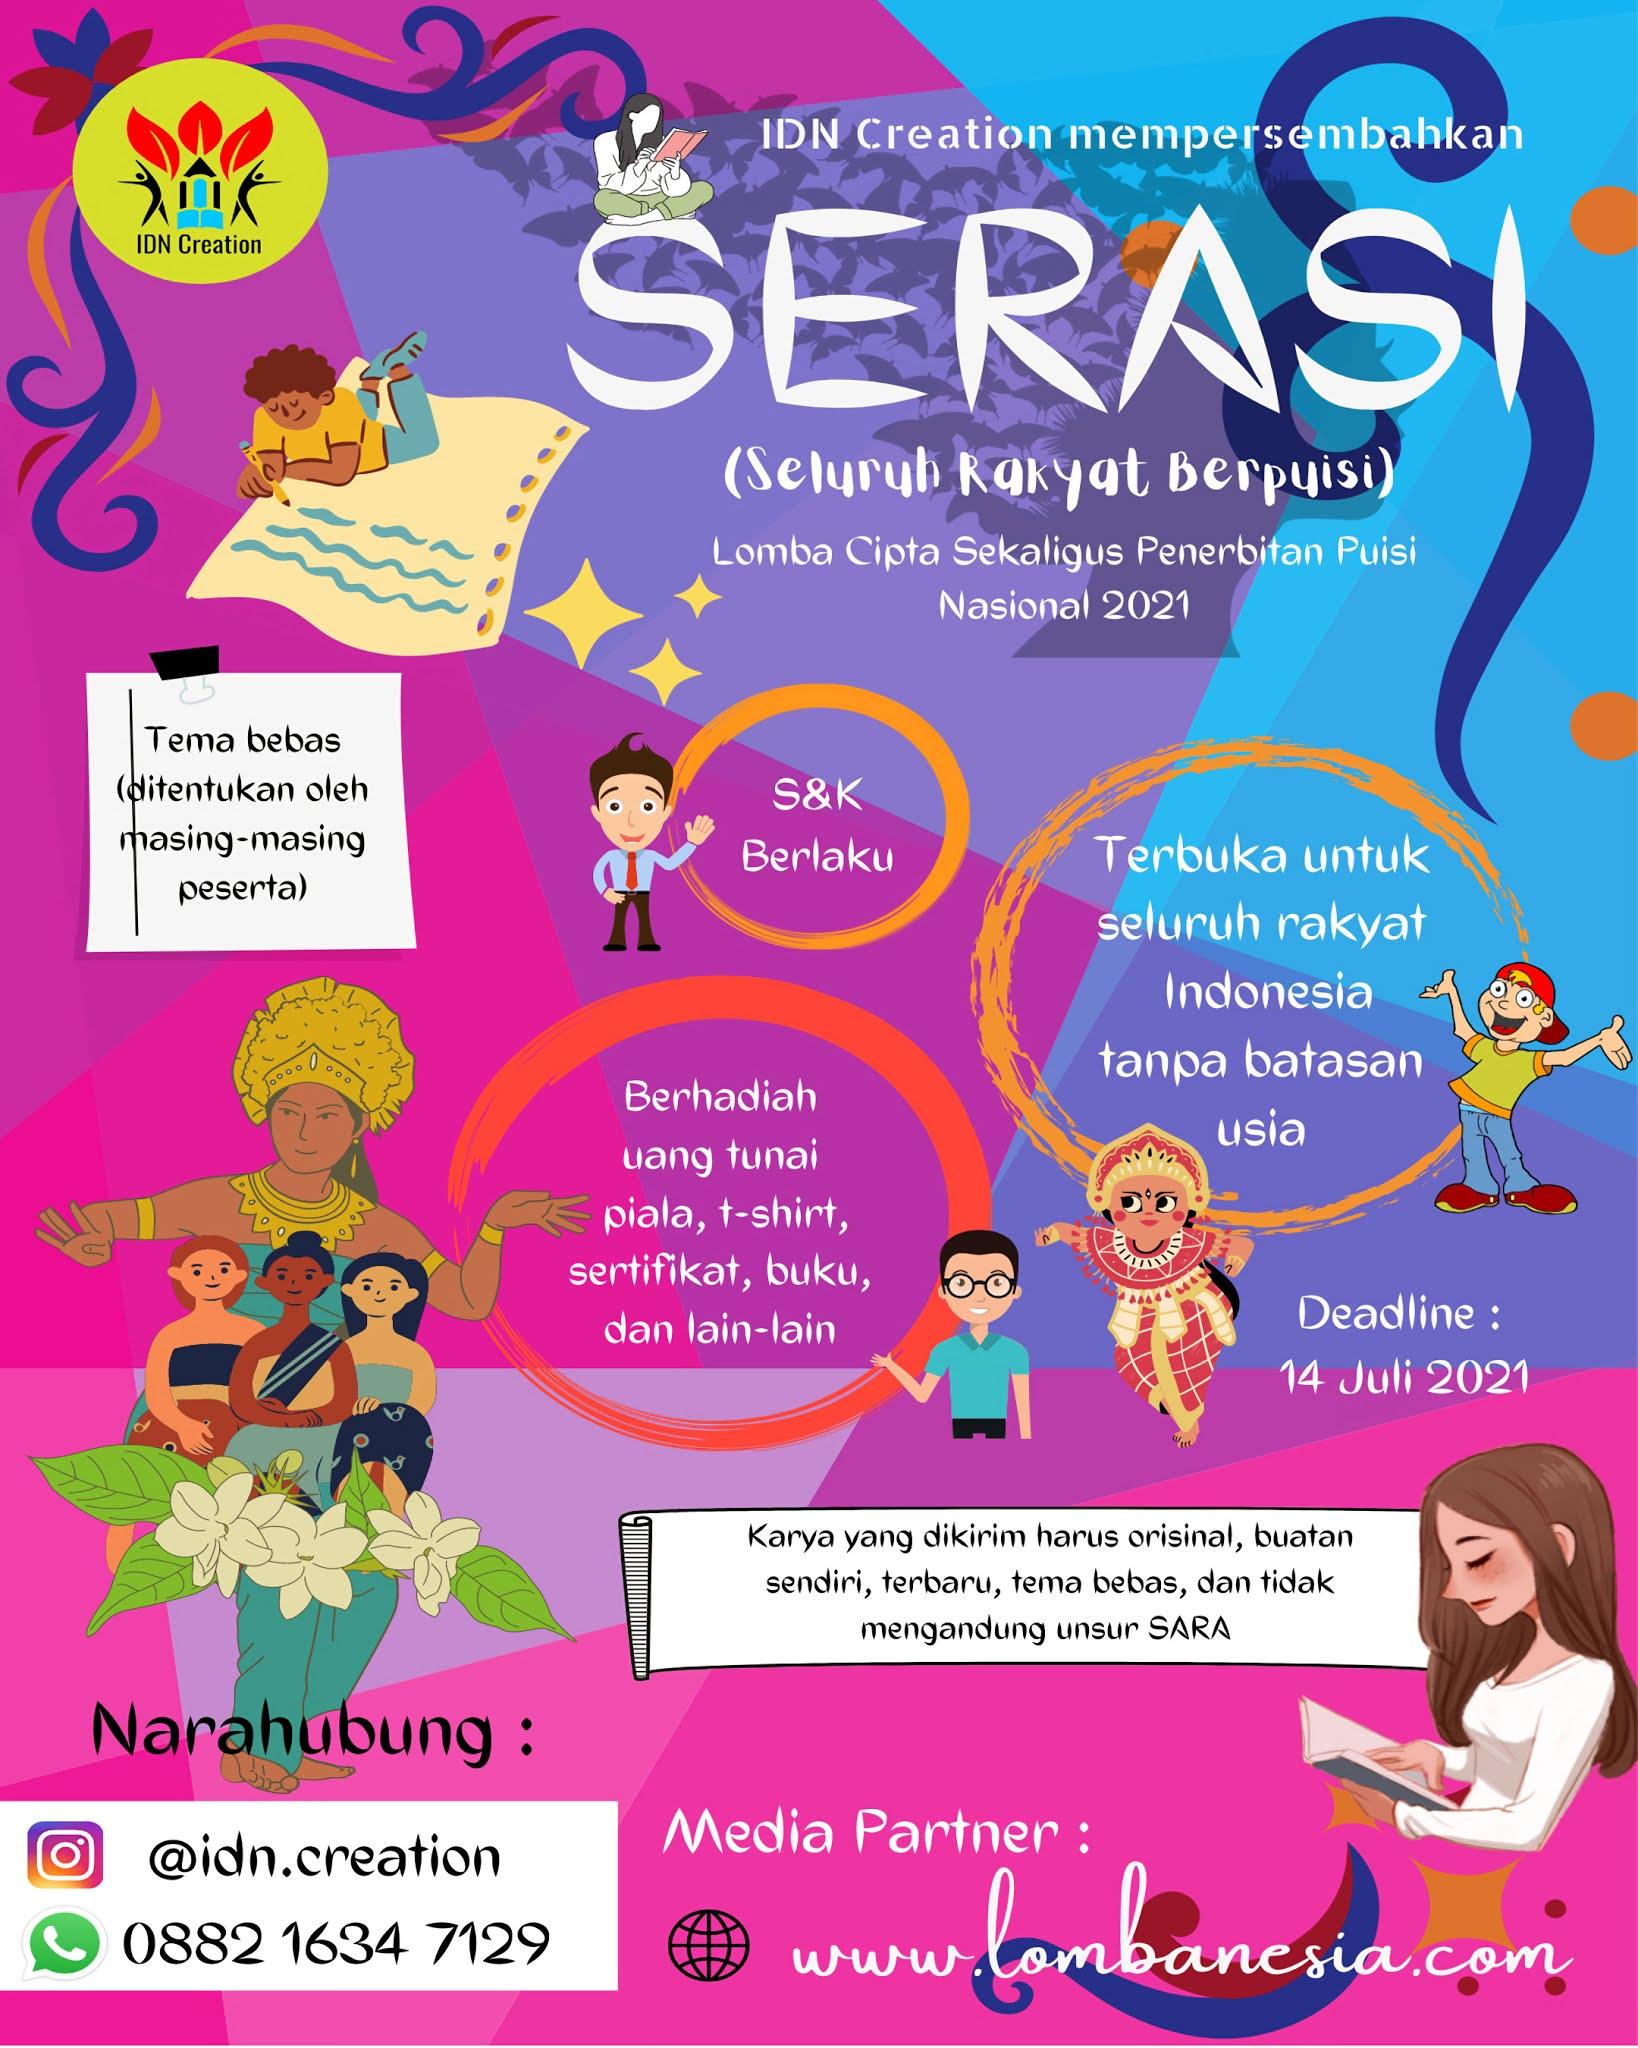 SERASI (Seluruh Rakyat Berpuisi) Lomba Menulis Puisi Tingkat Nasional Berhadiah Uang Tunai Bersama IDN Creation